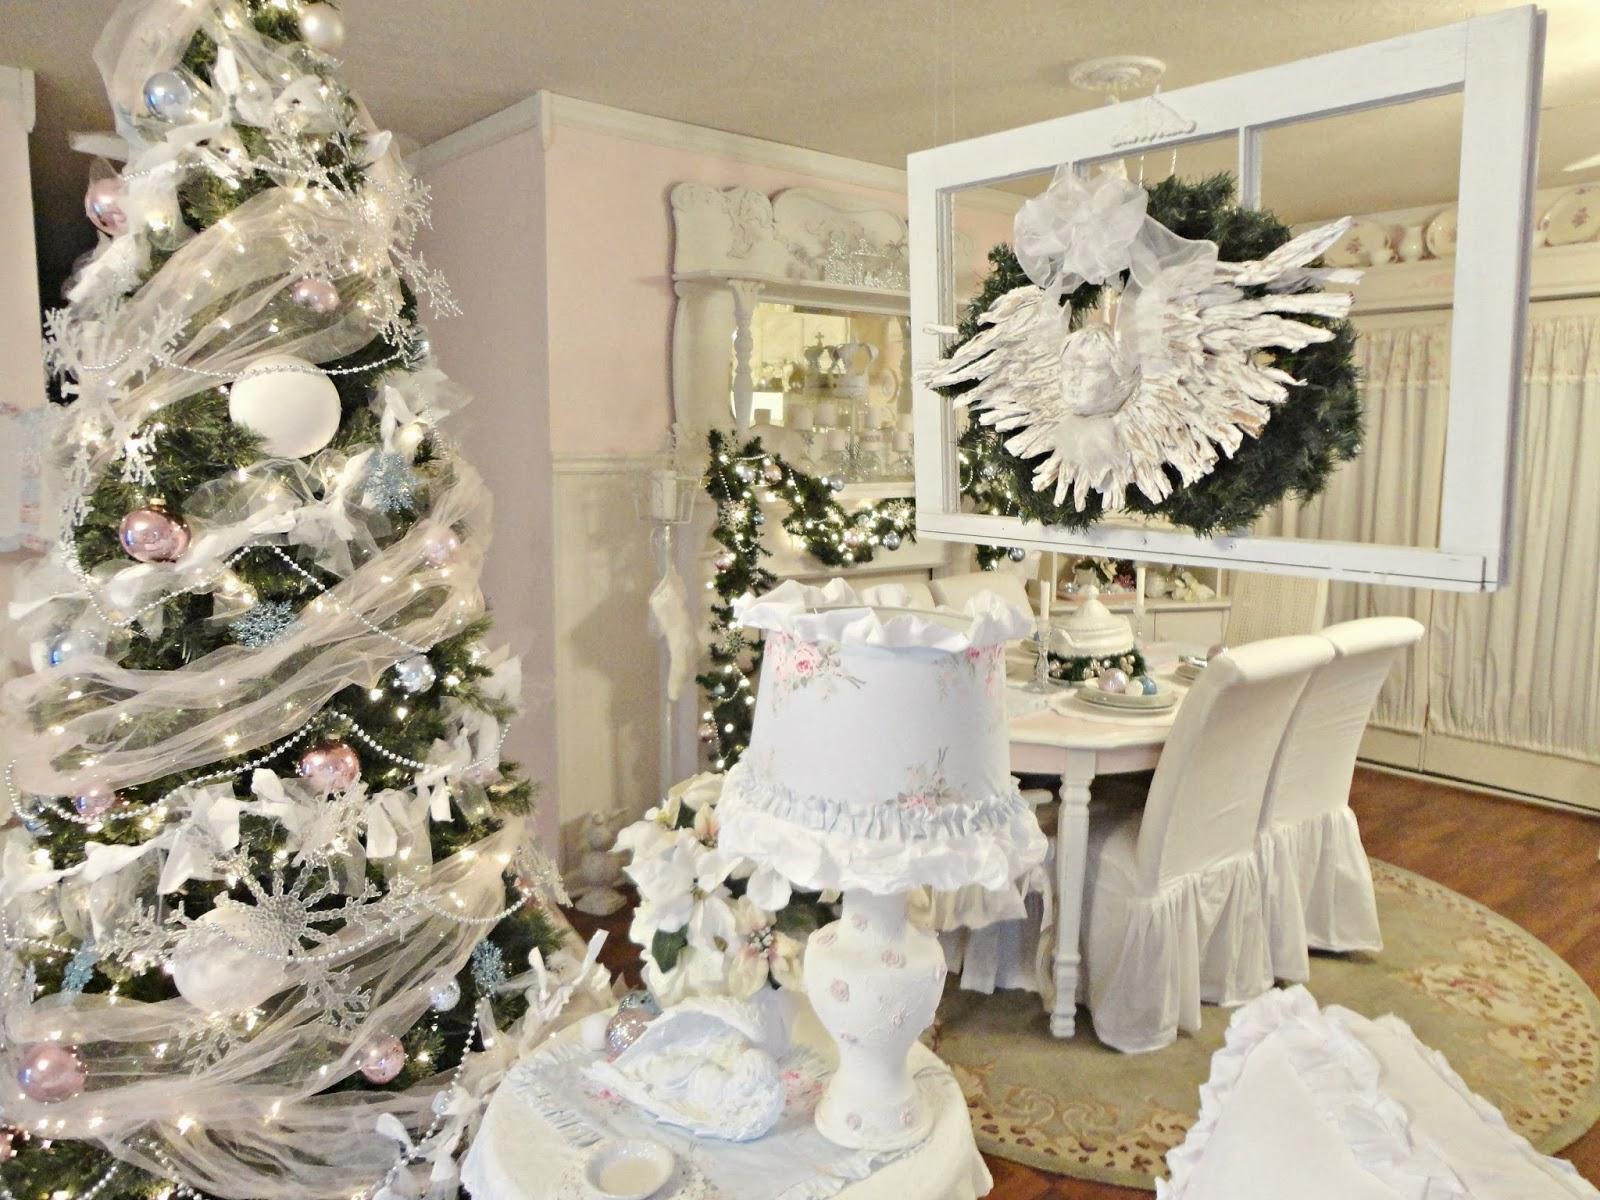 Sweet Melanie~: Our Living Room For Christmas